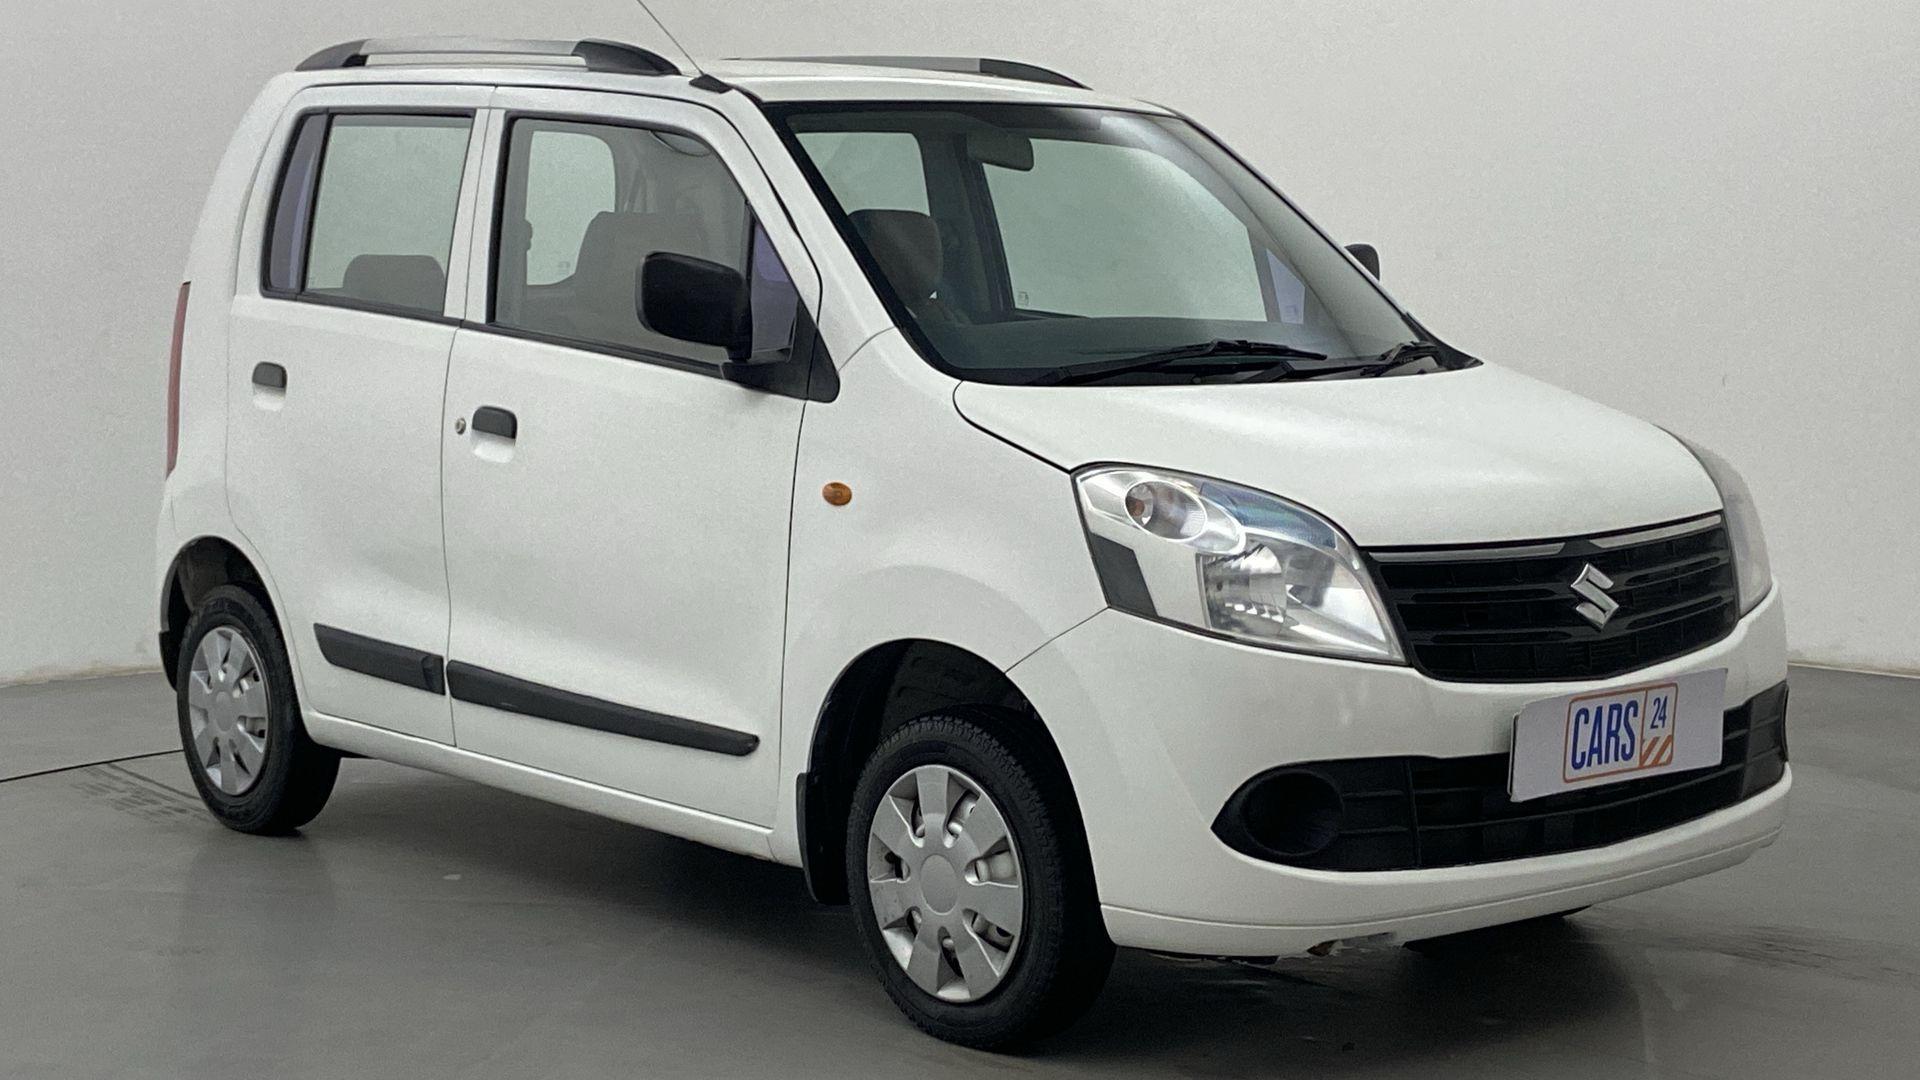 2011 Maruti Wagon R 1.0 LXI